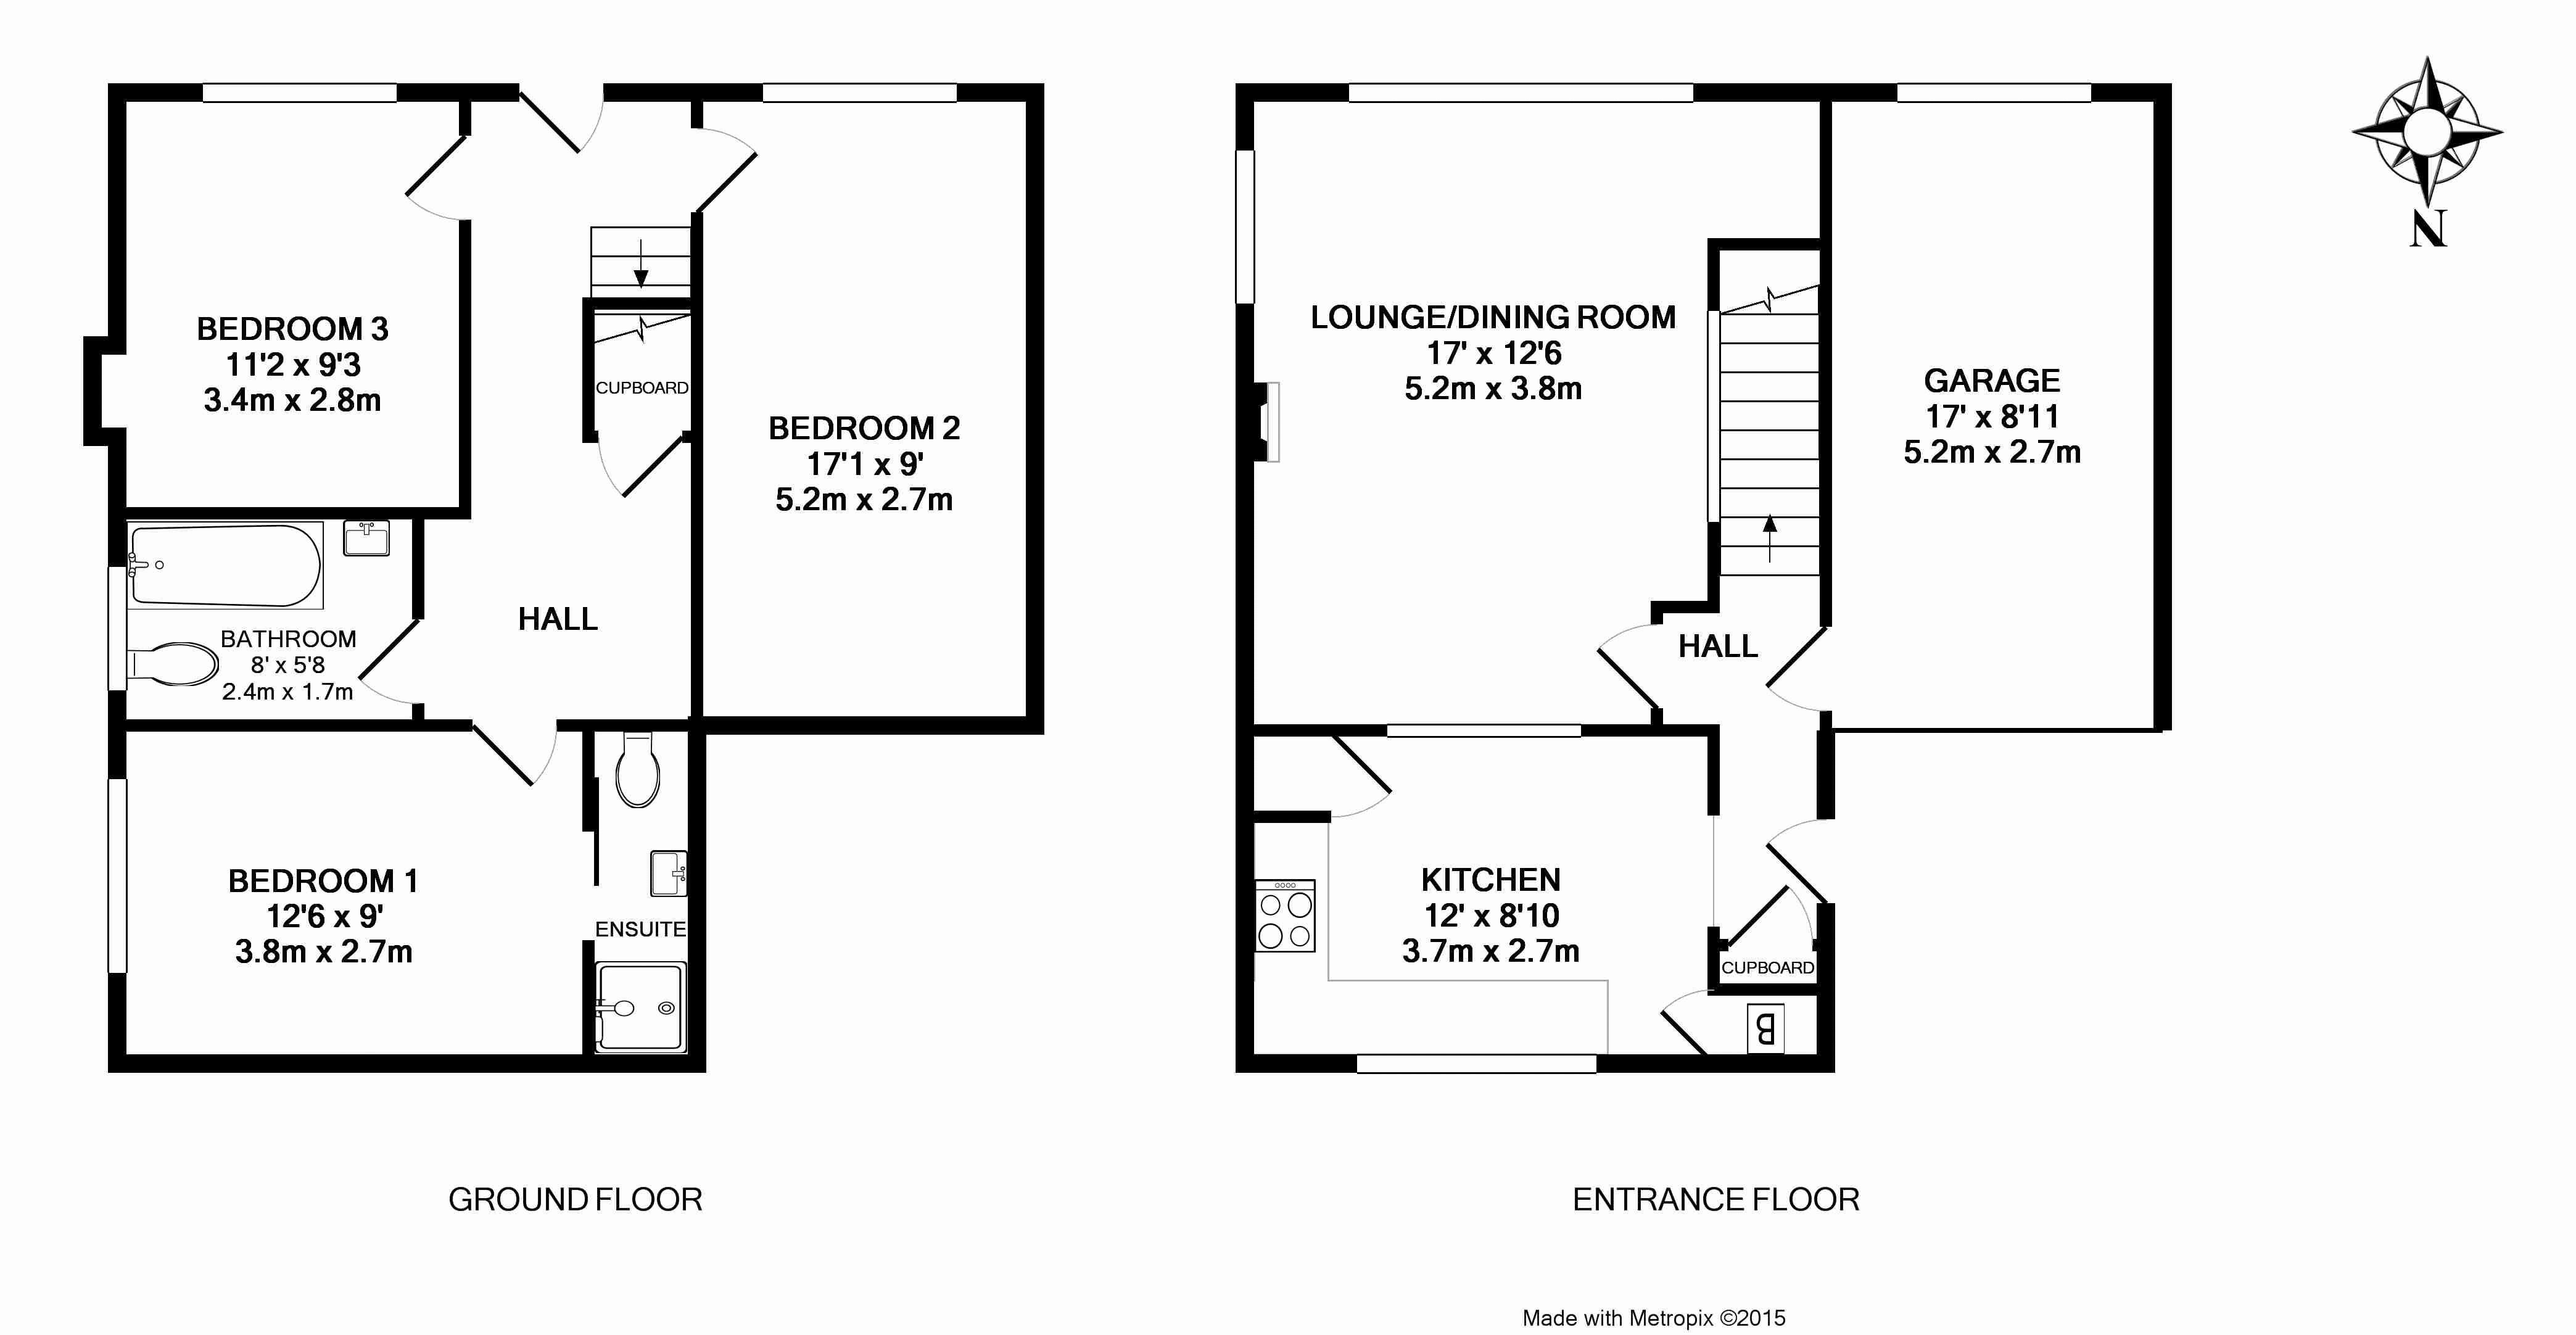 160 Penwill Way Floorplan